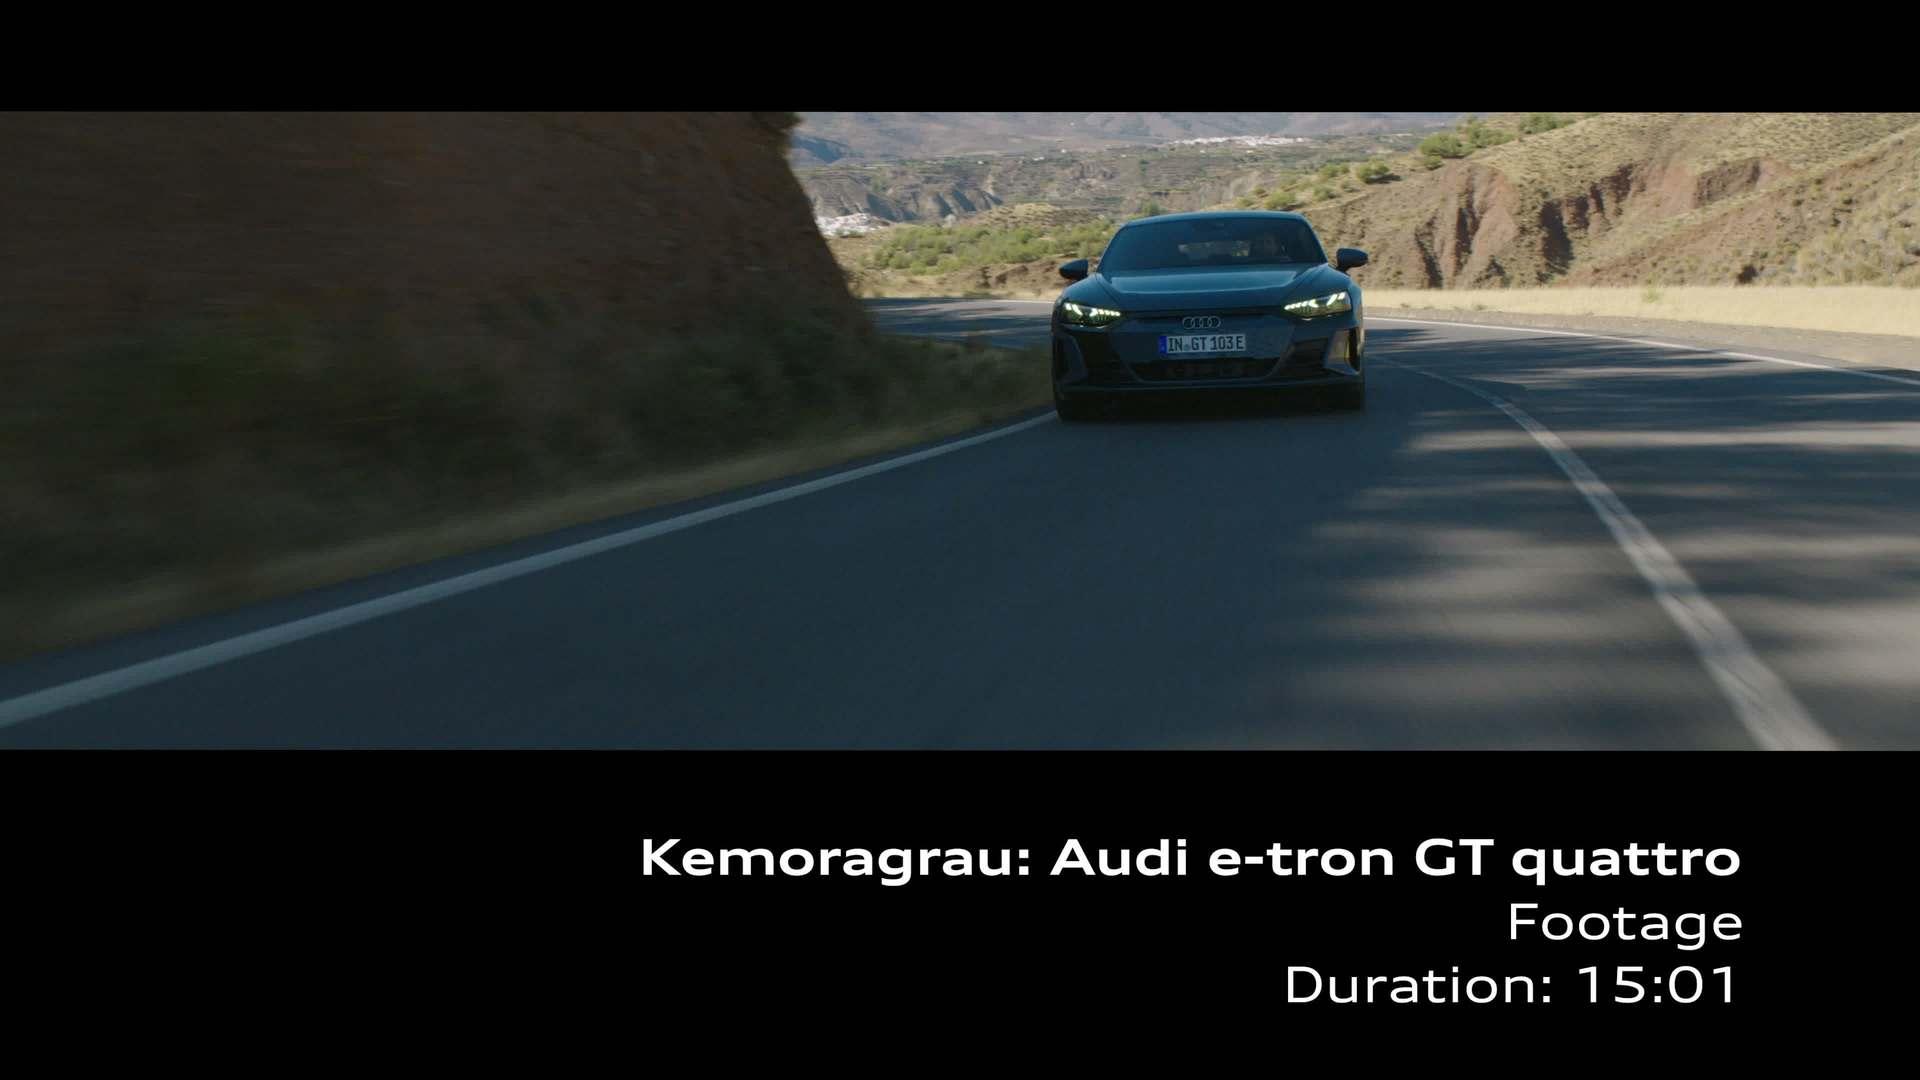 Footage: Audi e-tron GT quattro – Kemoragrau